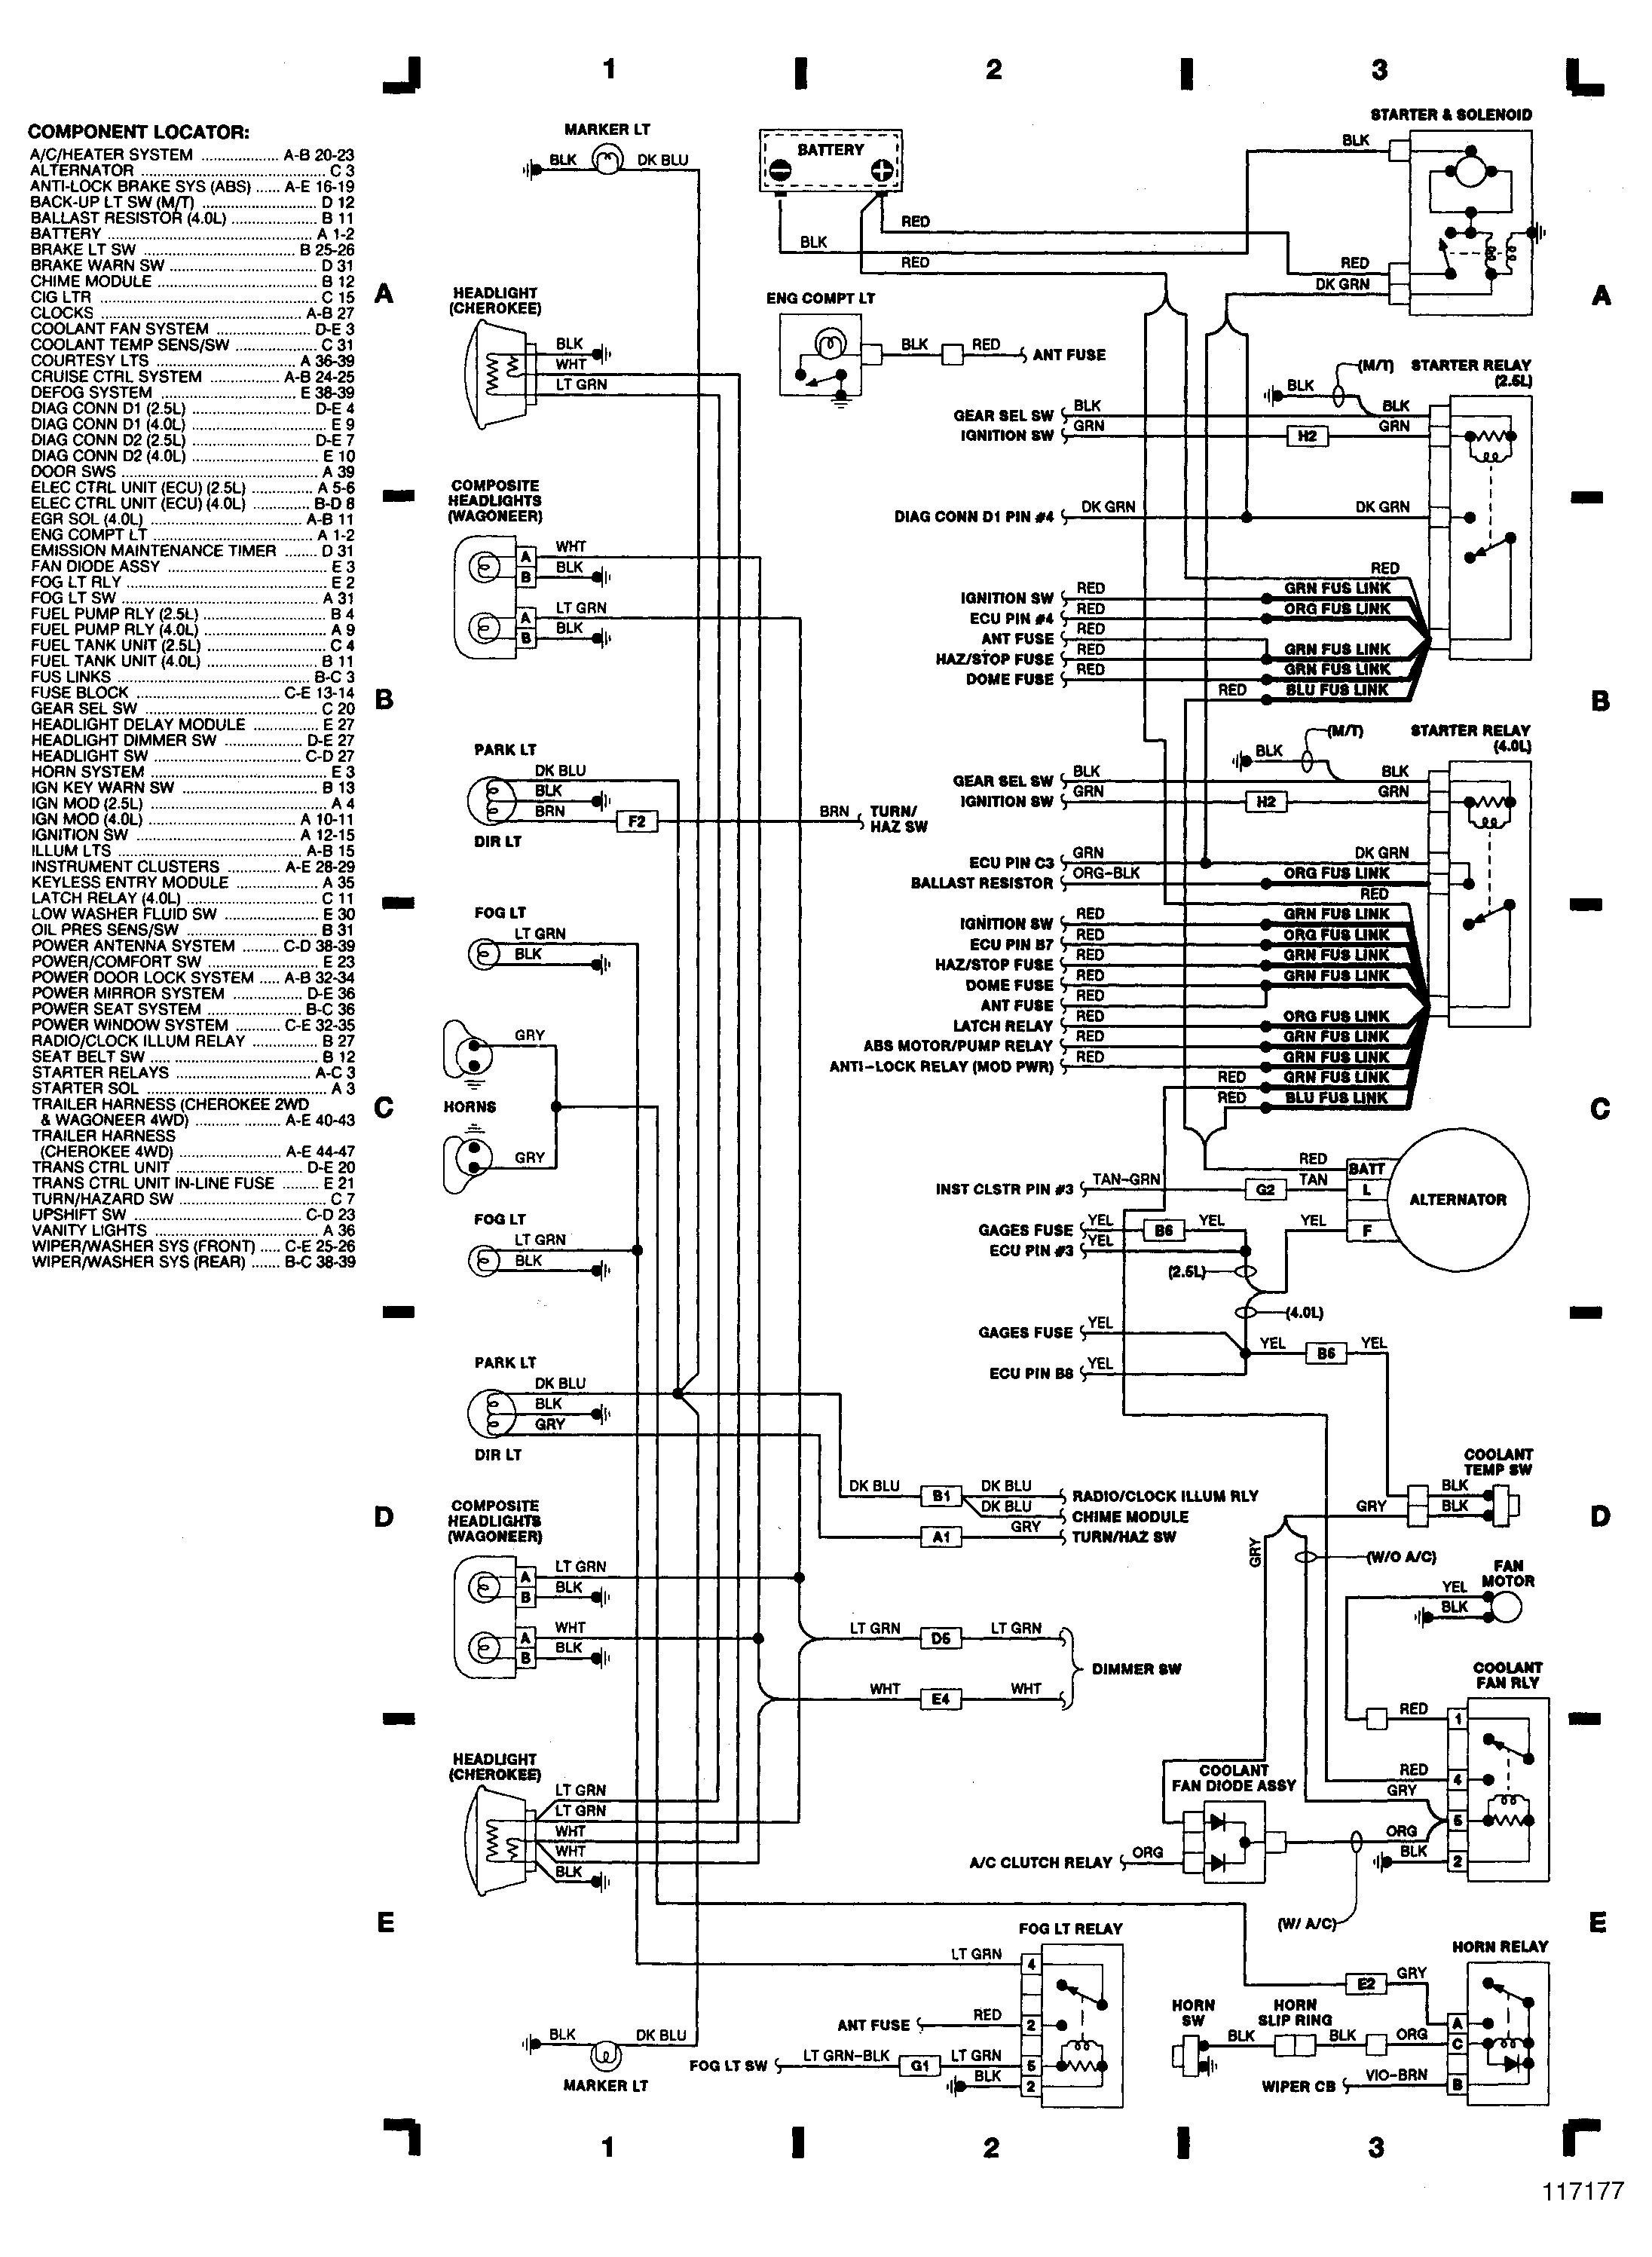 2001 jeep cherokee wiring harness wiring diagram expert 2001 jeep cherokee wiring harness wiring diagram fascinating